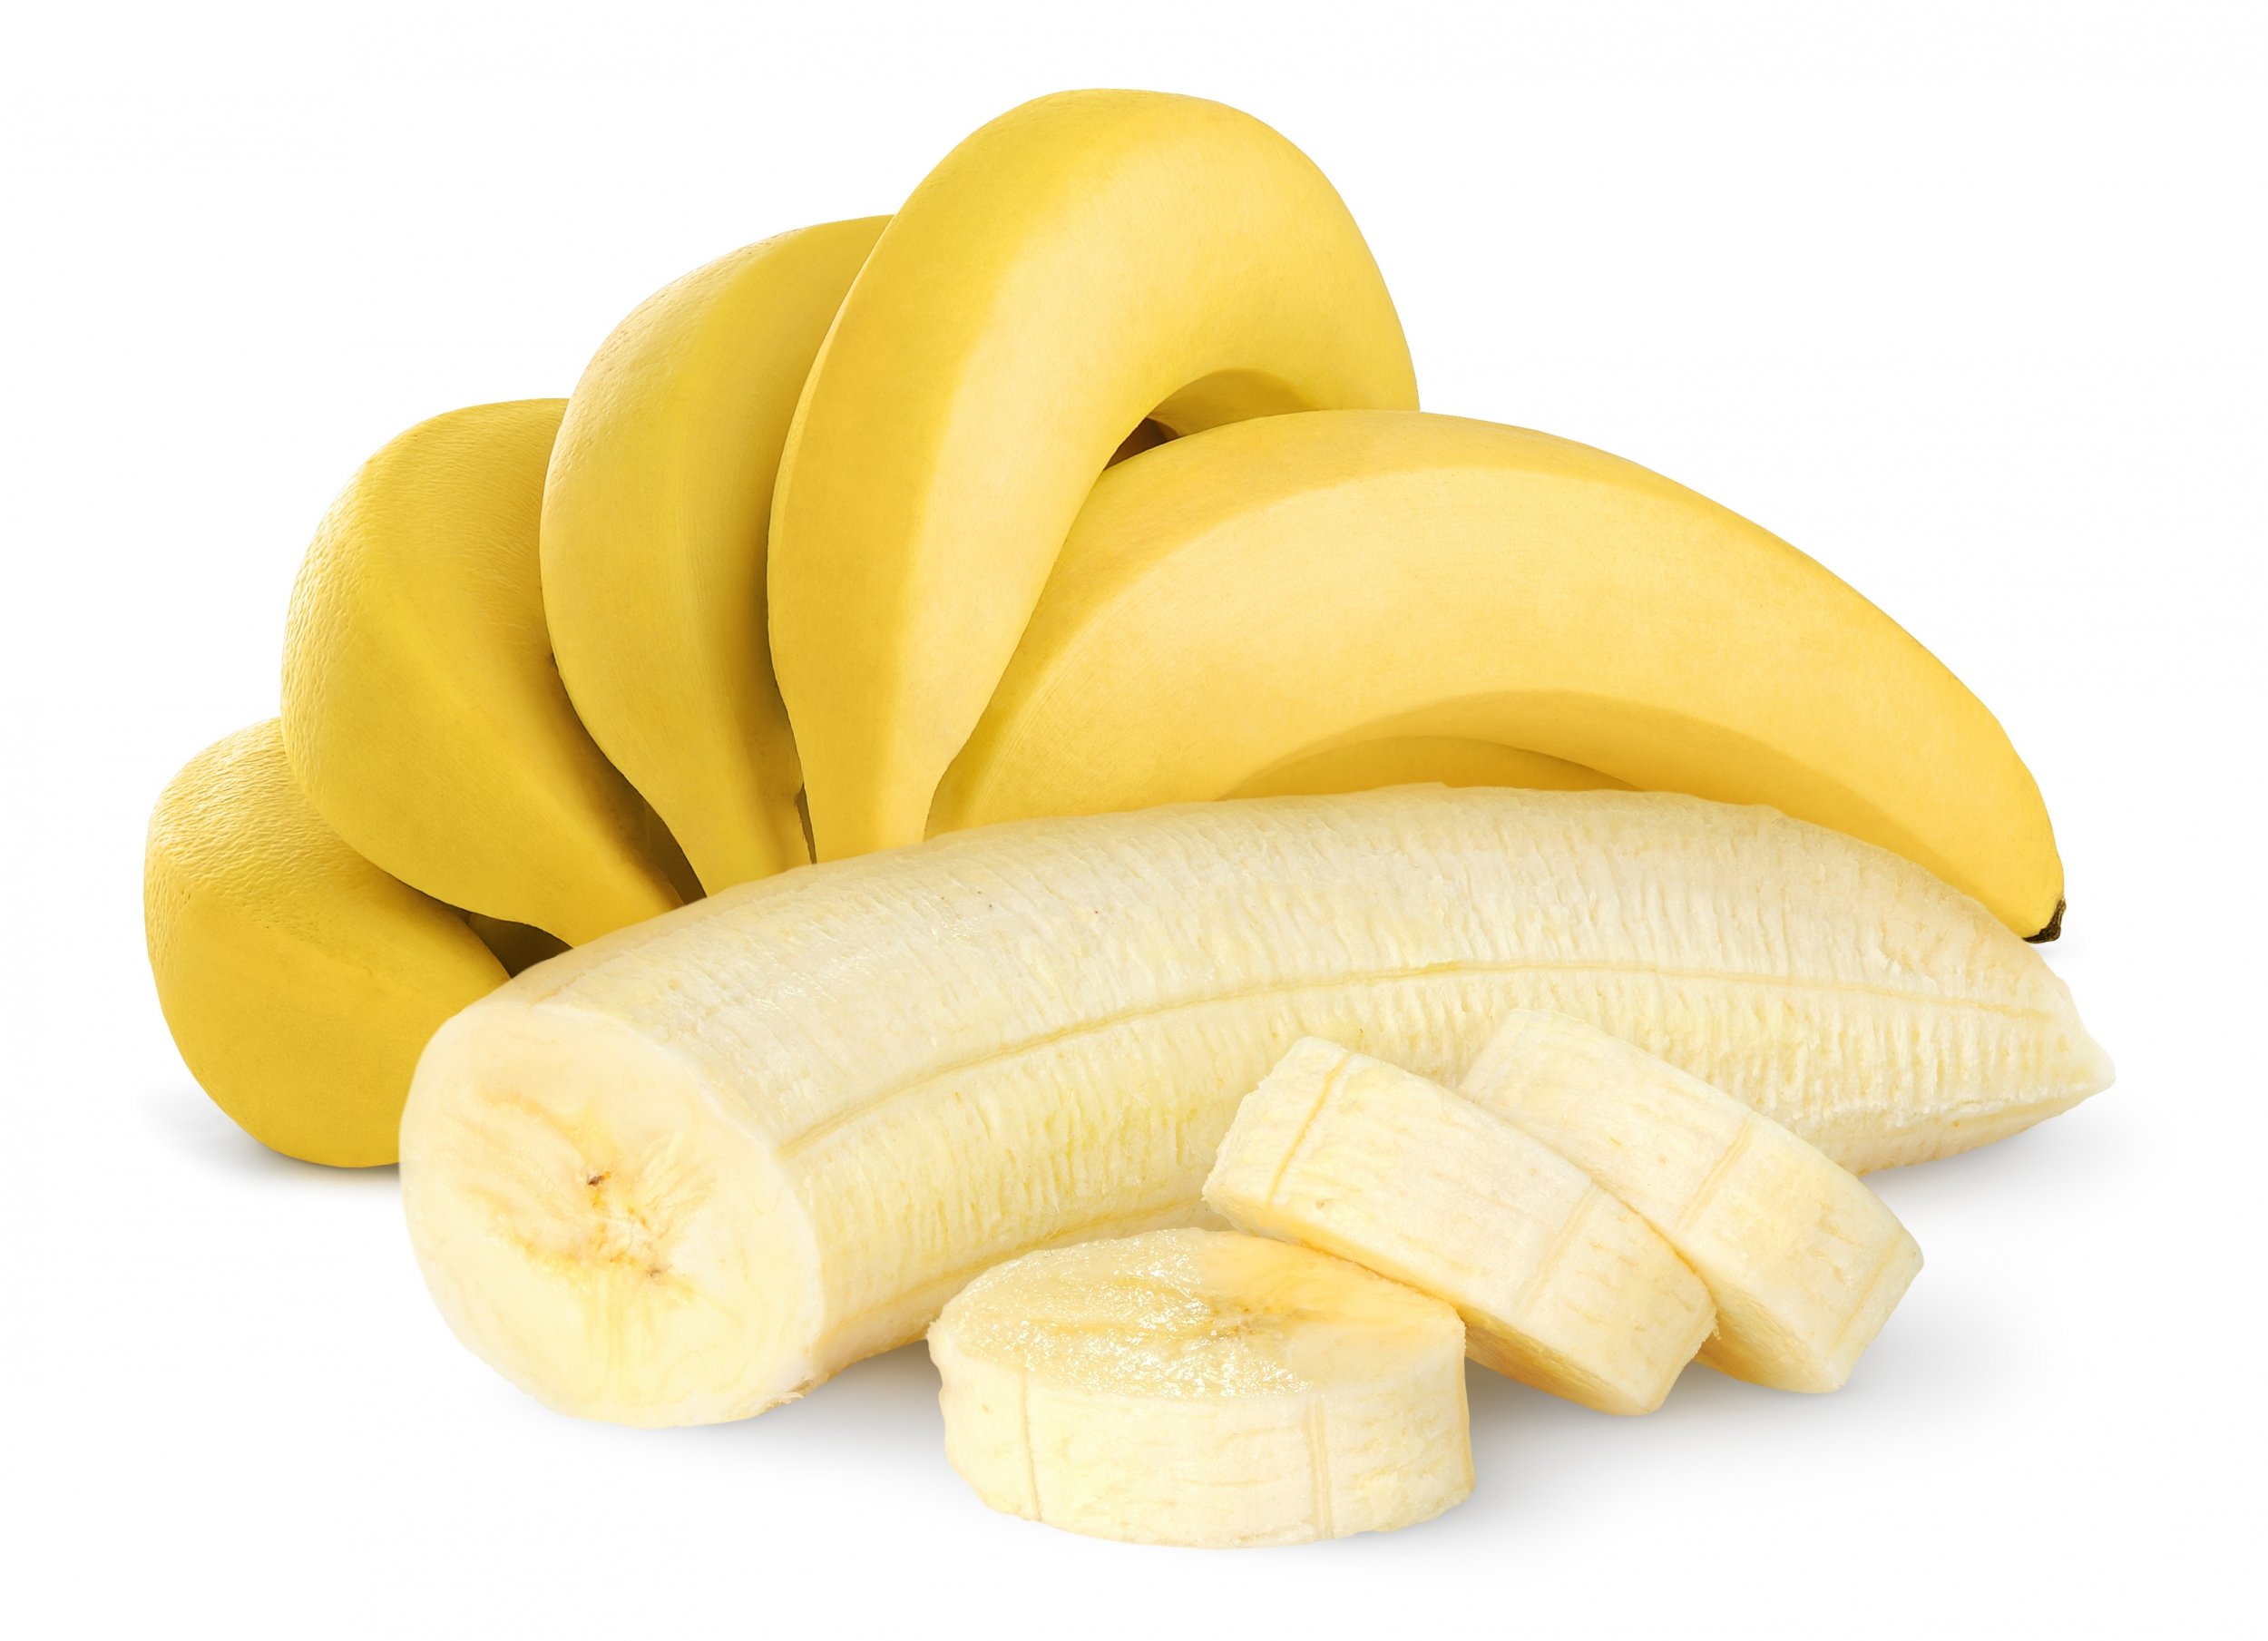 502-banane